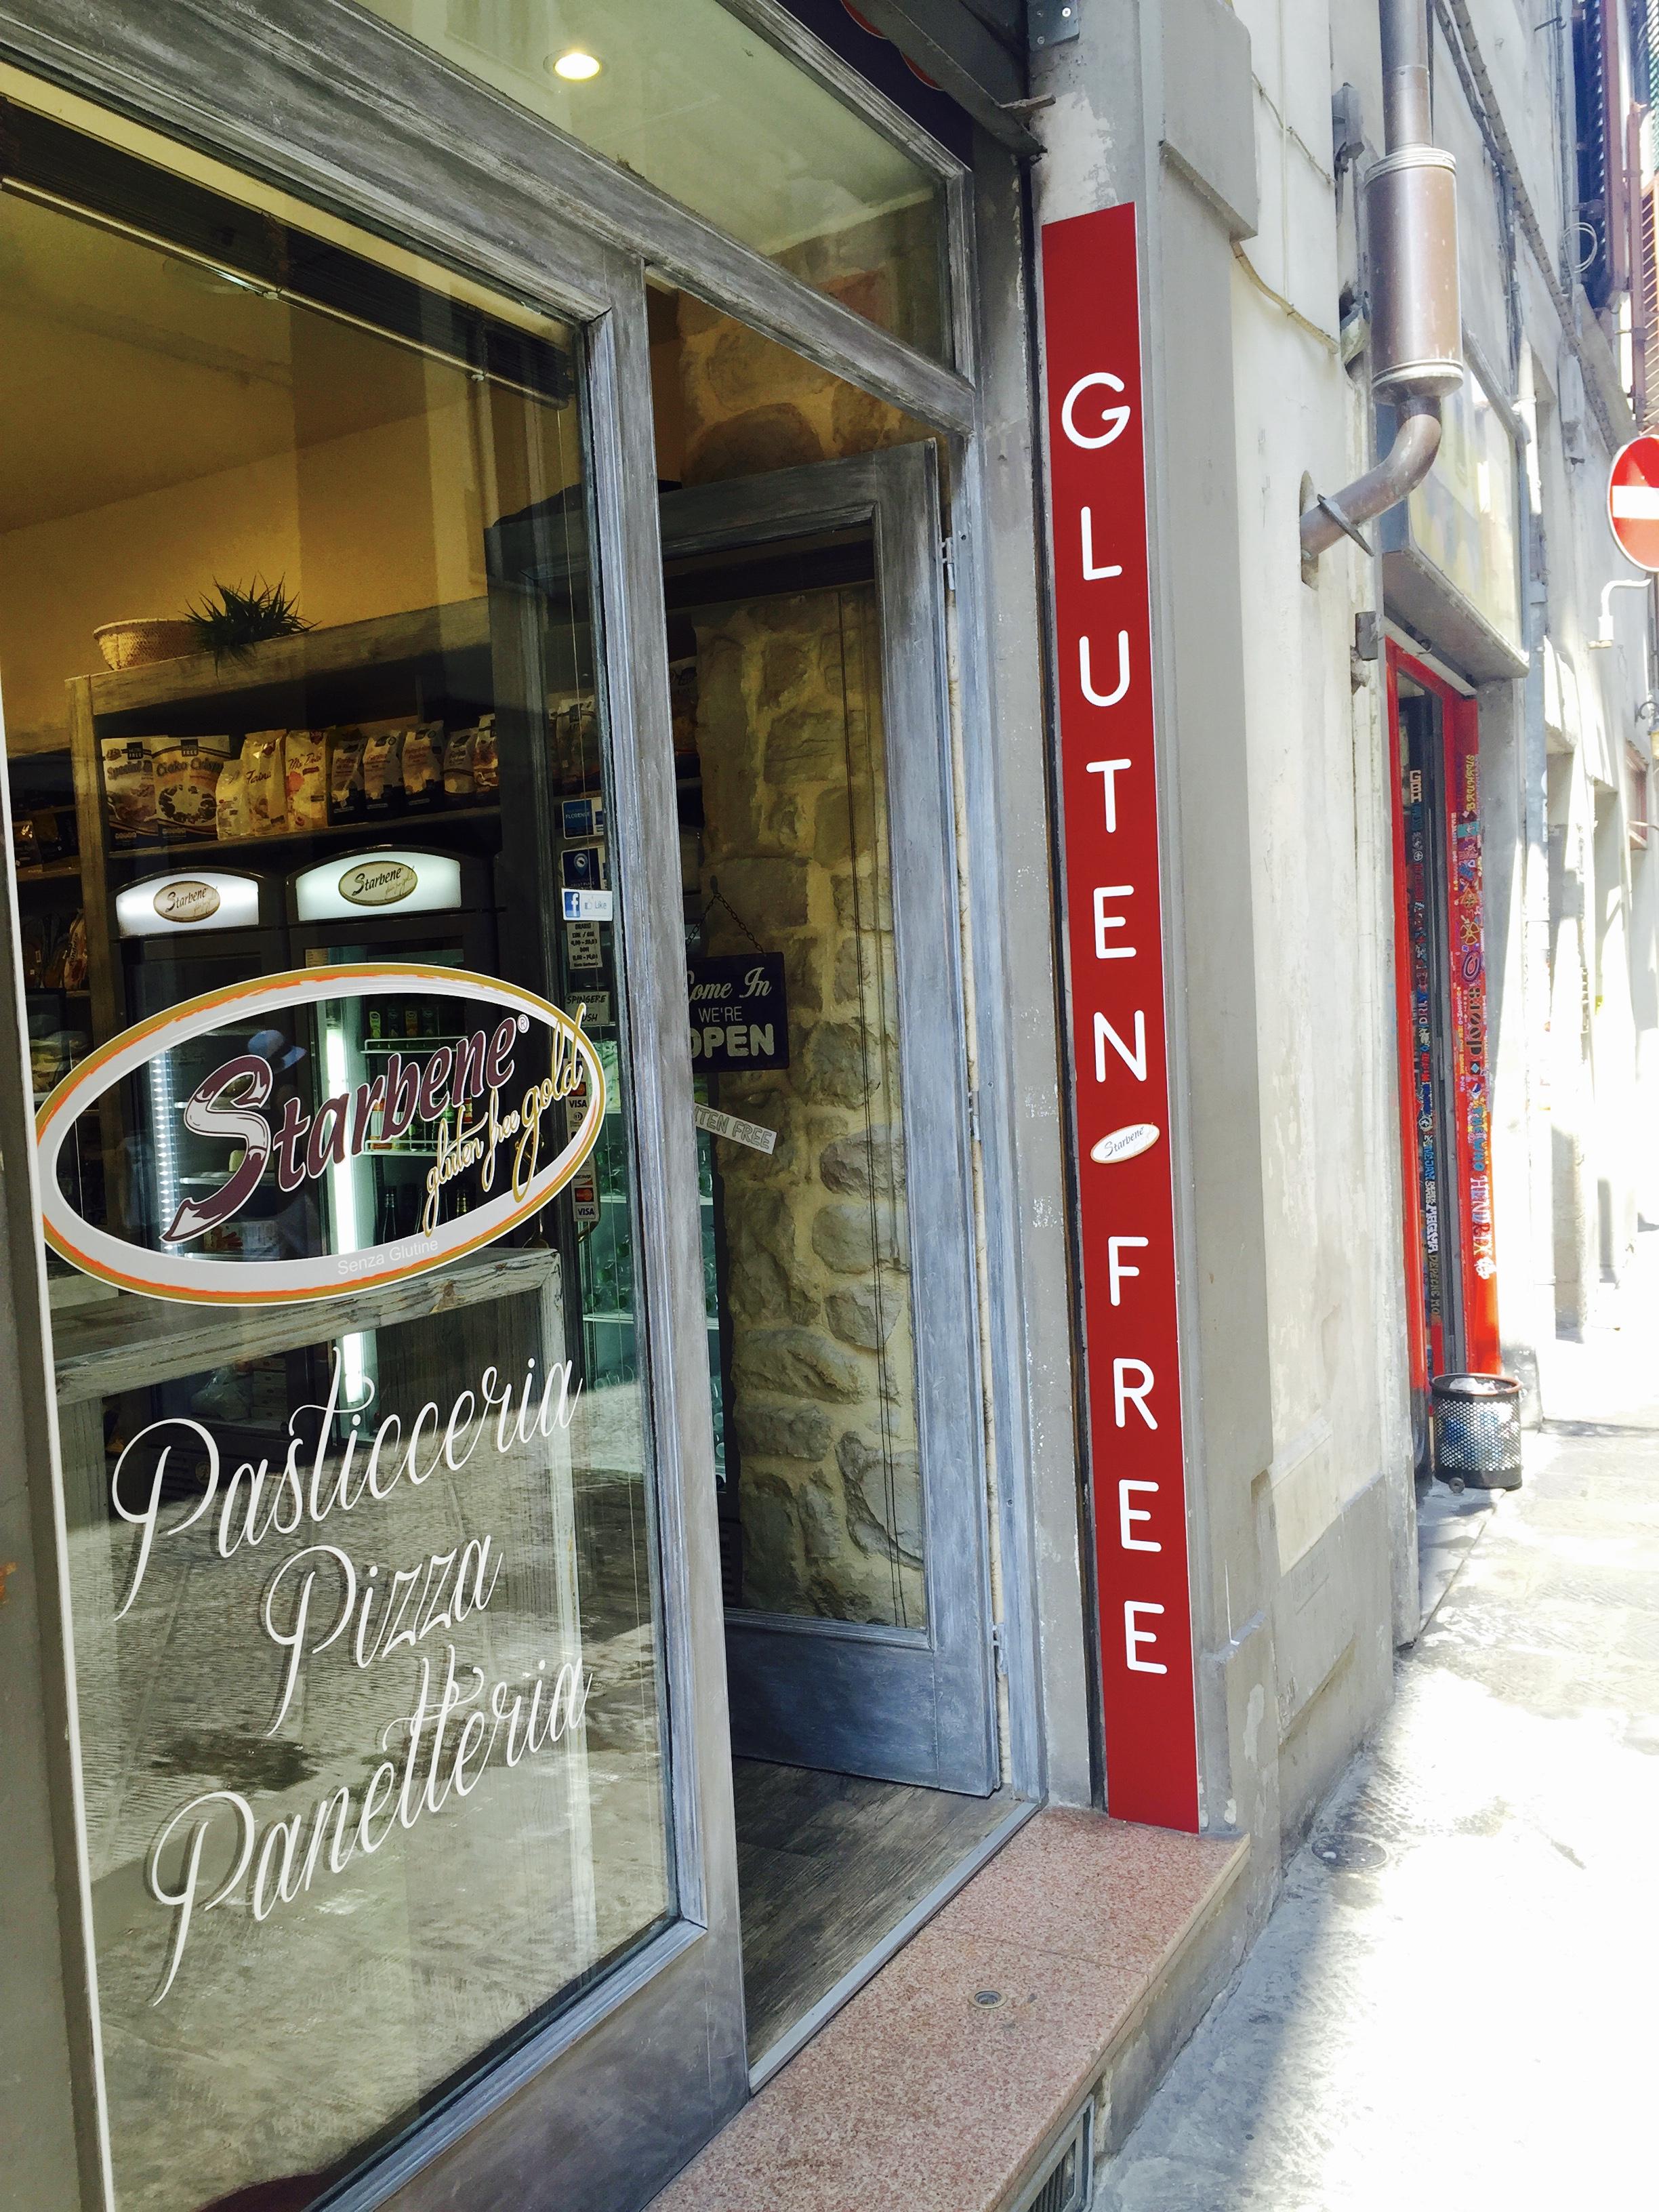 Starbene Gold gluten free backery.jpg